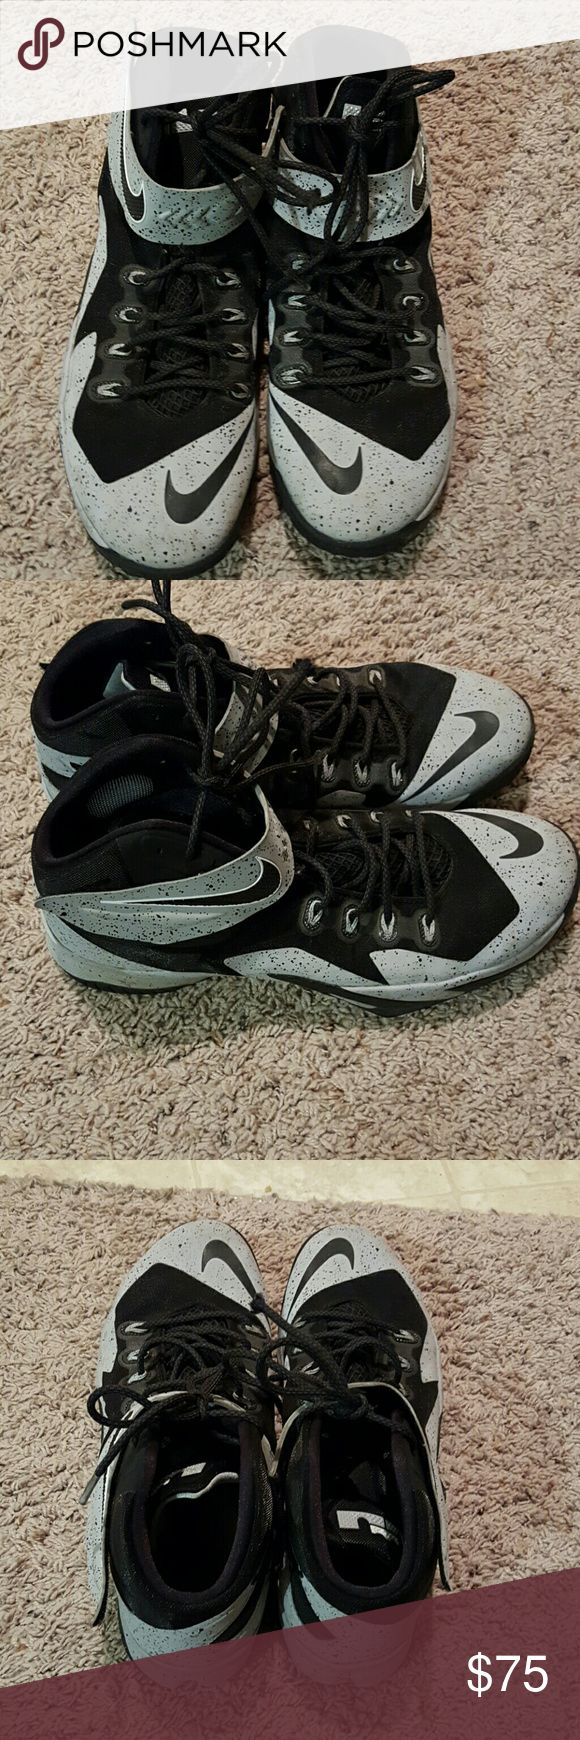 25+ Best Ideas about Size 14 Mens Shoes on Pinterest | Spot price ...